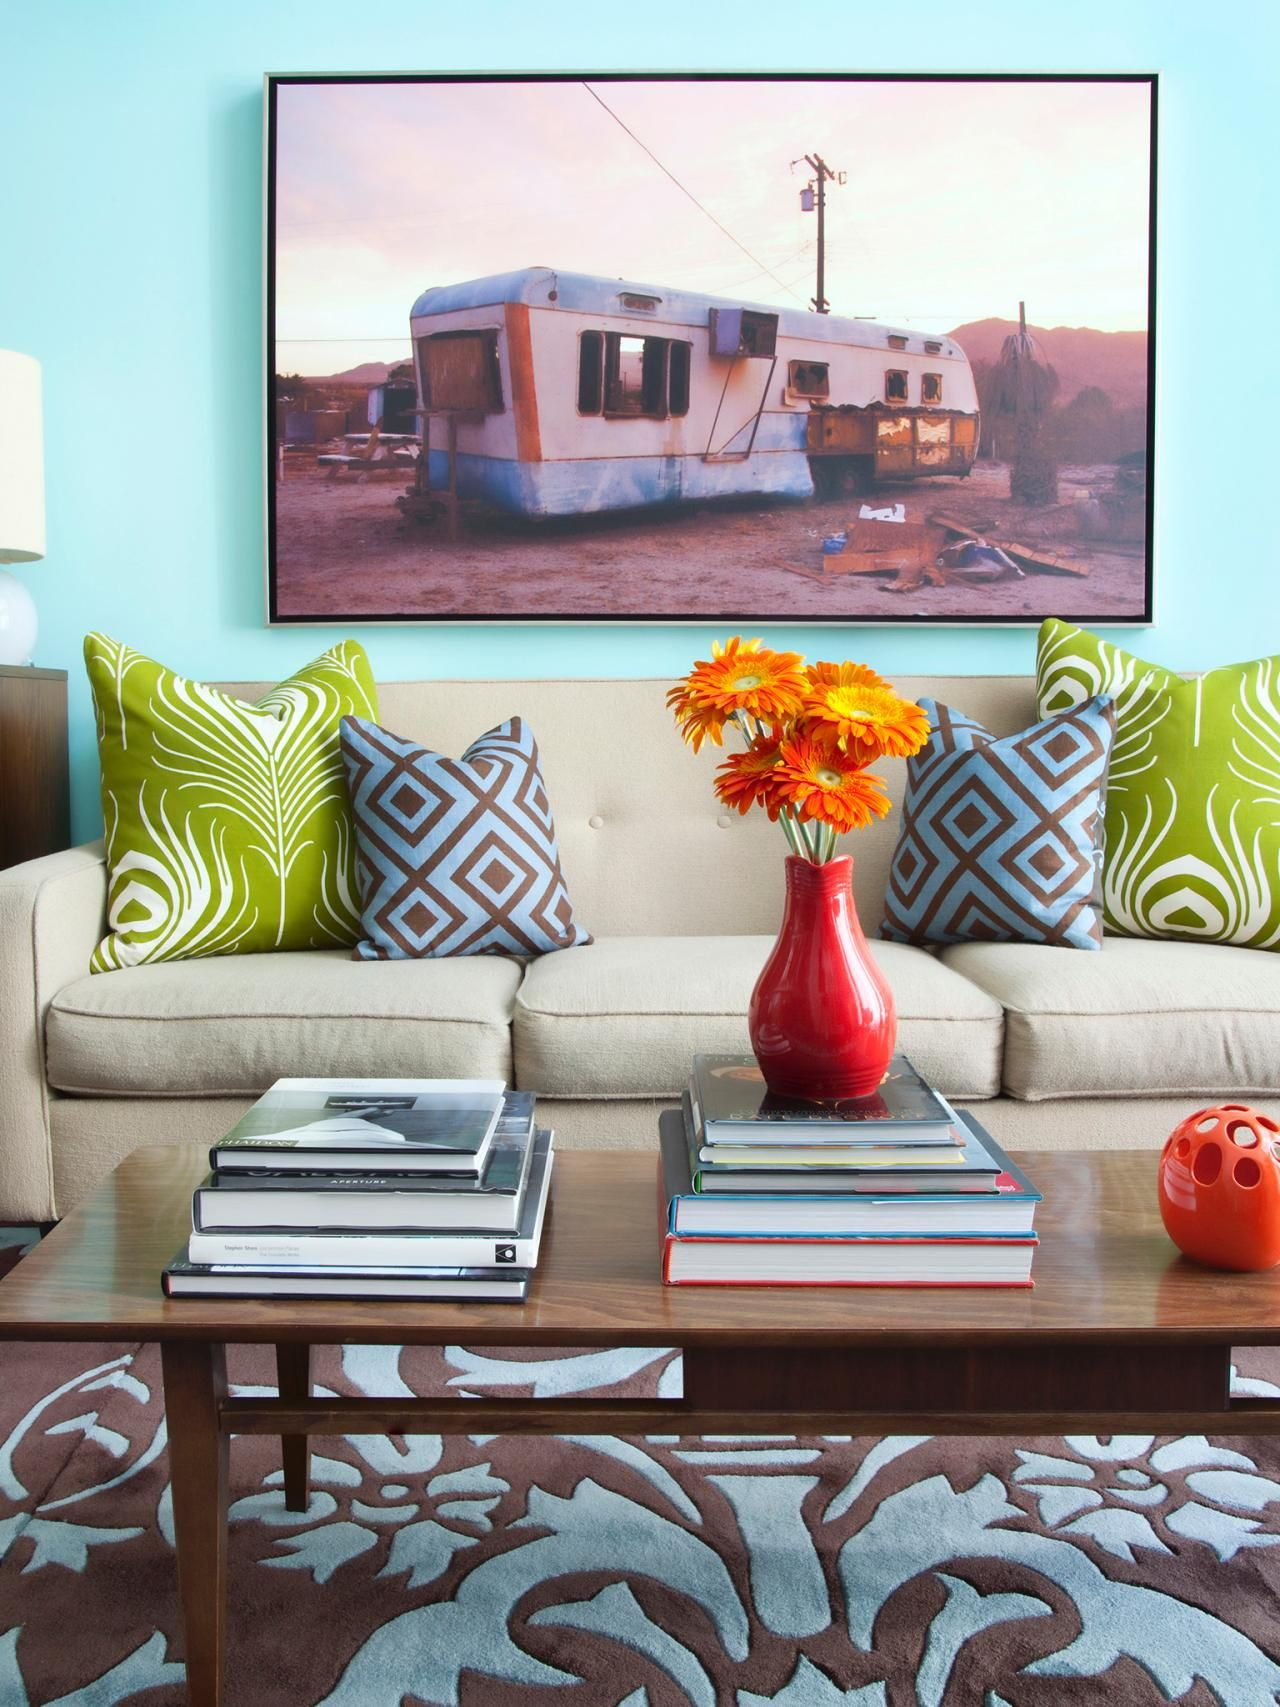 Design Trend Decorating With Blue  Hgtv Design Trends And Unique Choosing Living Room Furniture Design Decoration